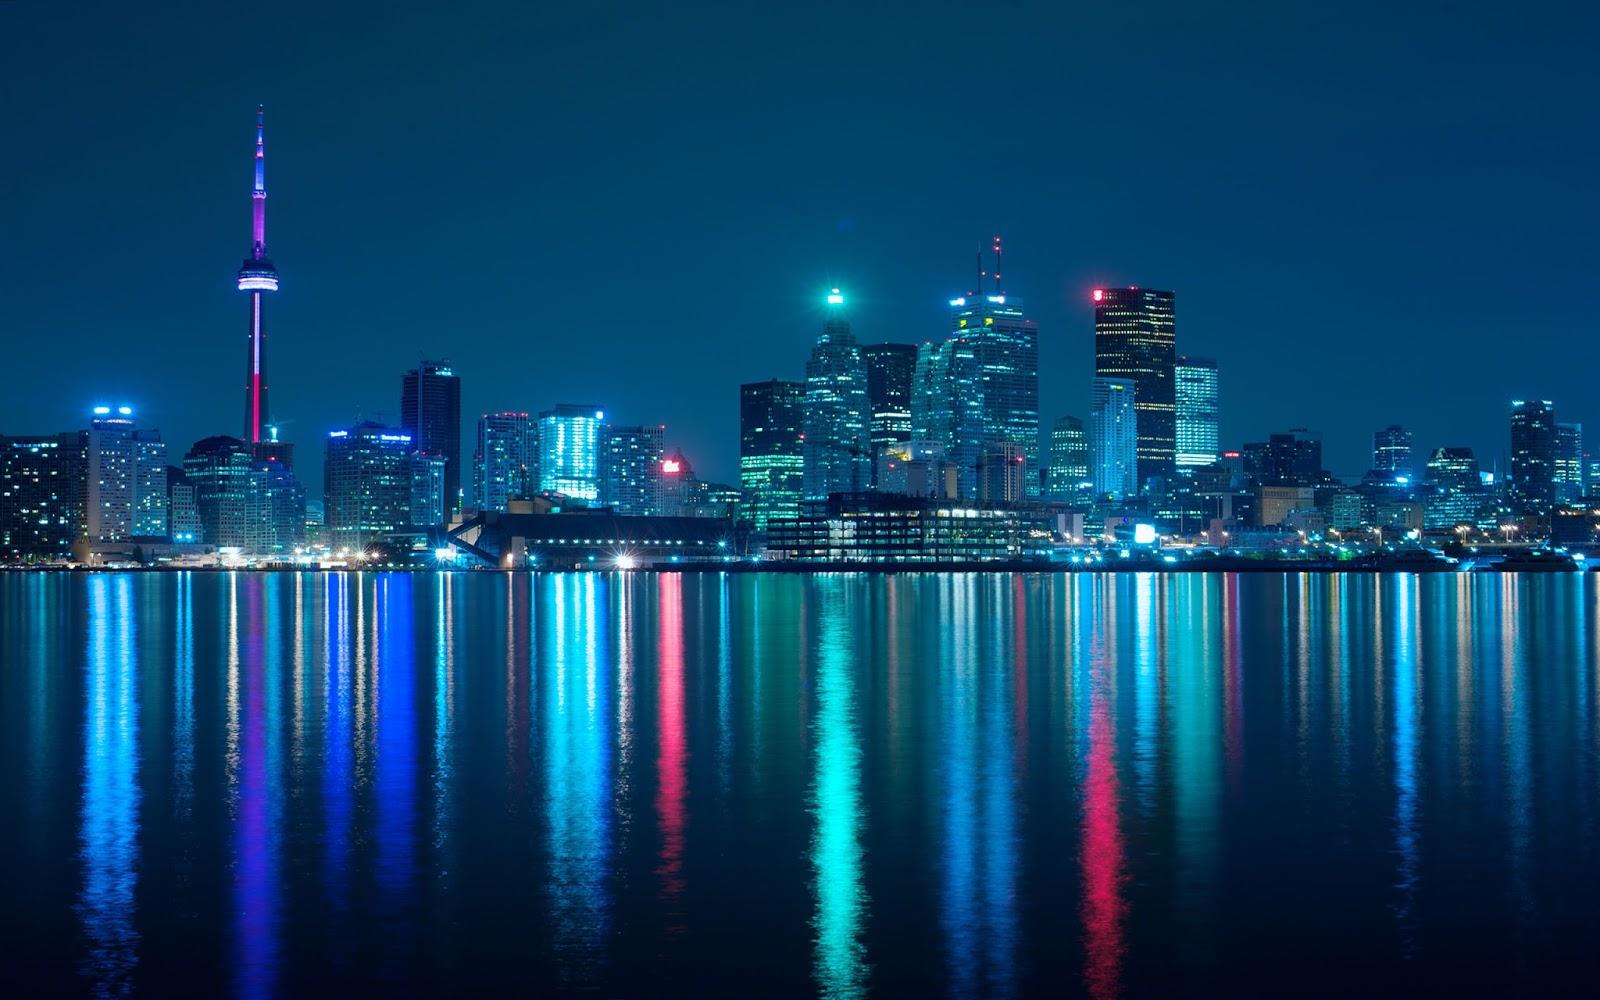 DREAM ZONE Toronto Canada City HD Wallpapers 1600x1000